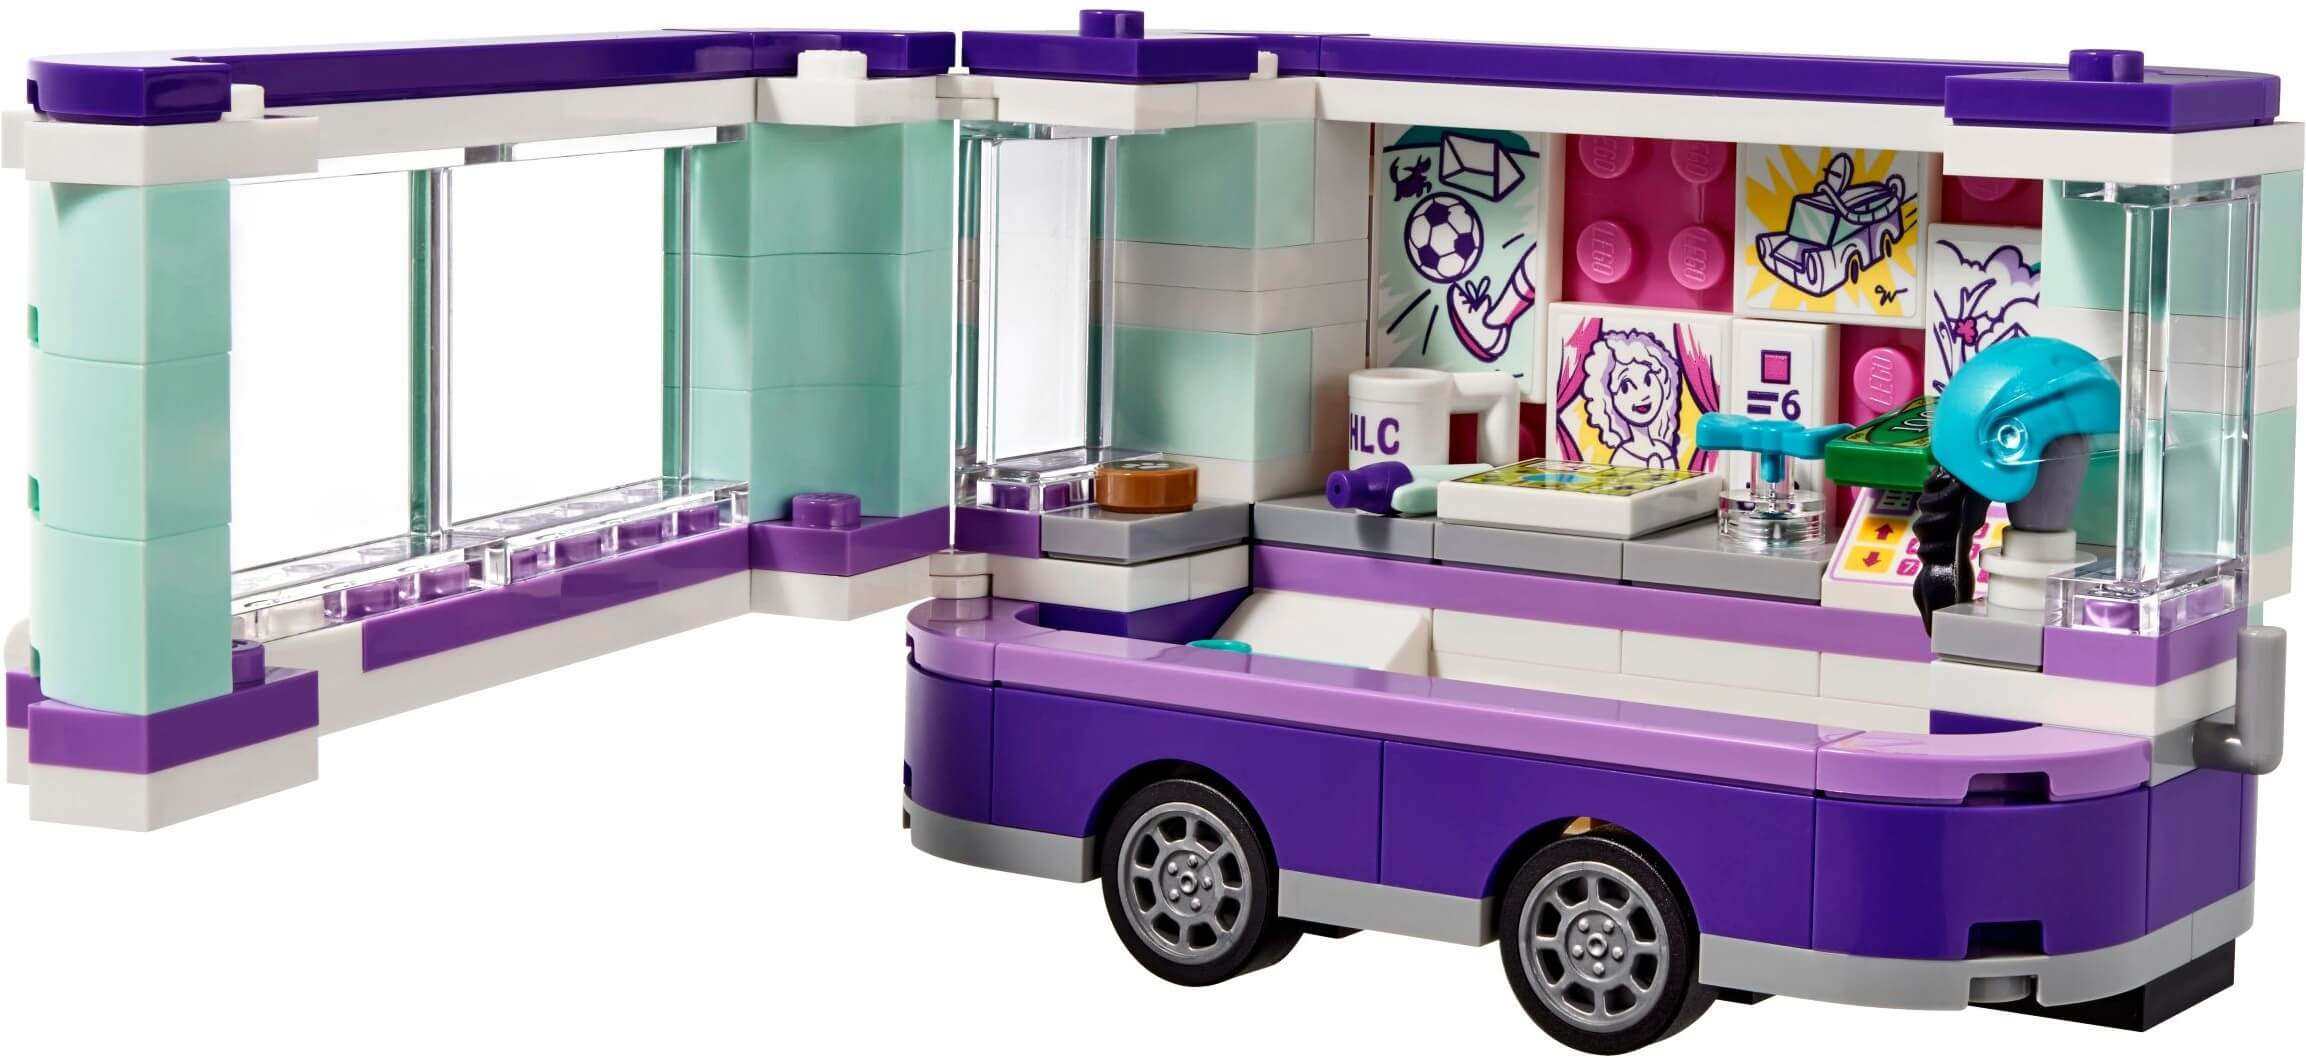 Mua đồ chơi LEGO 41332 - LEGO Friends 41332 - Quầy bán Tranh của Emma (LEGO Friends 41332 Emma's Art Stand)